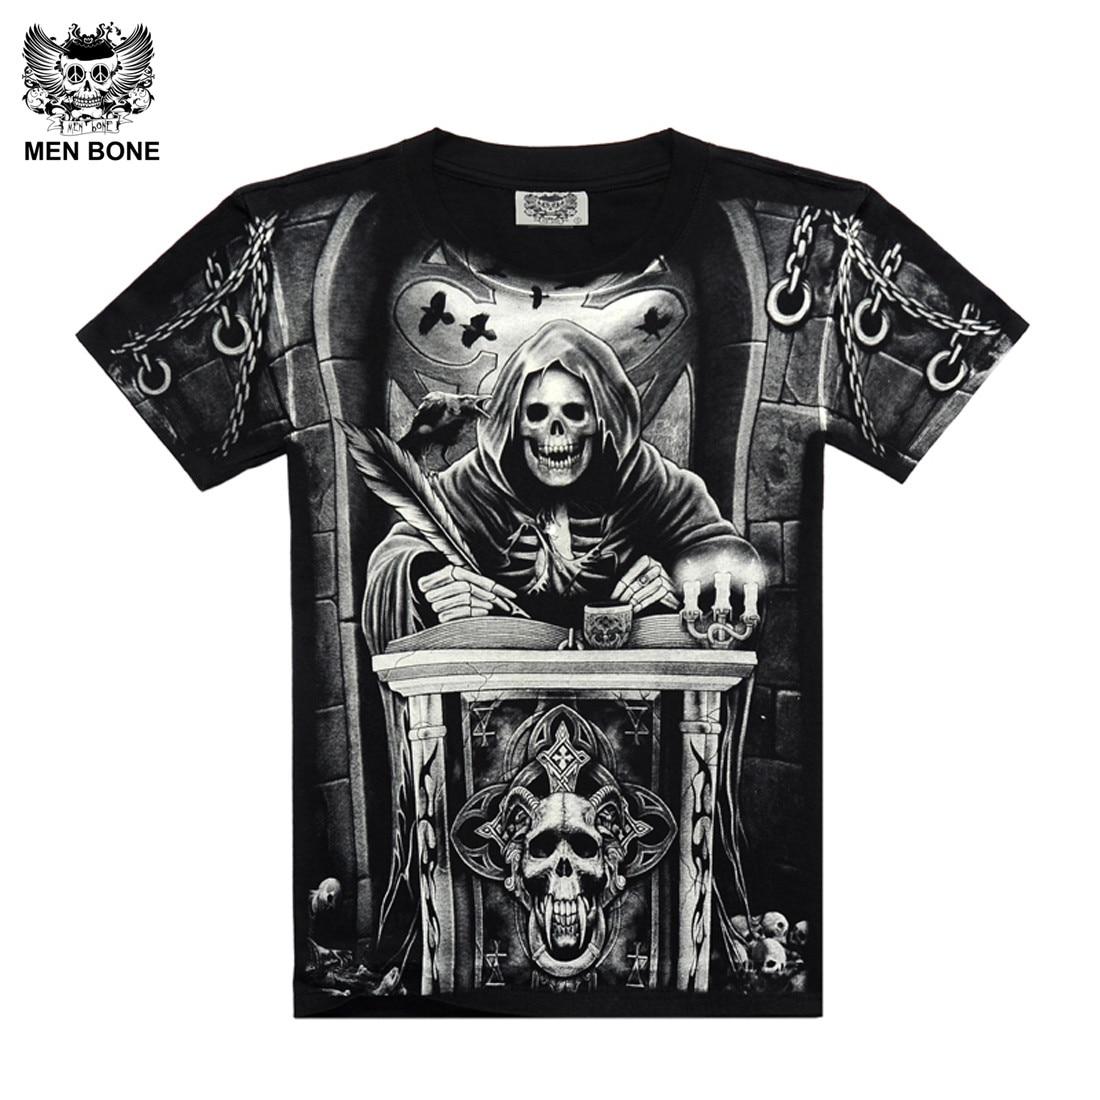 Men Bone Heavy Metal Style Grim Reaper Skull Tshirt